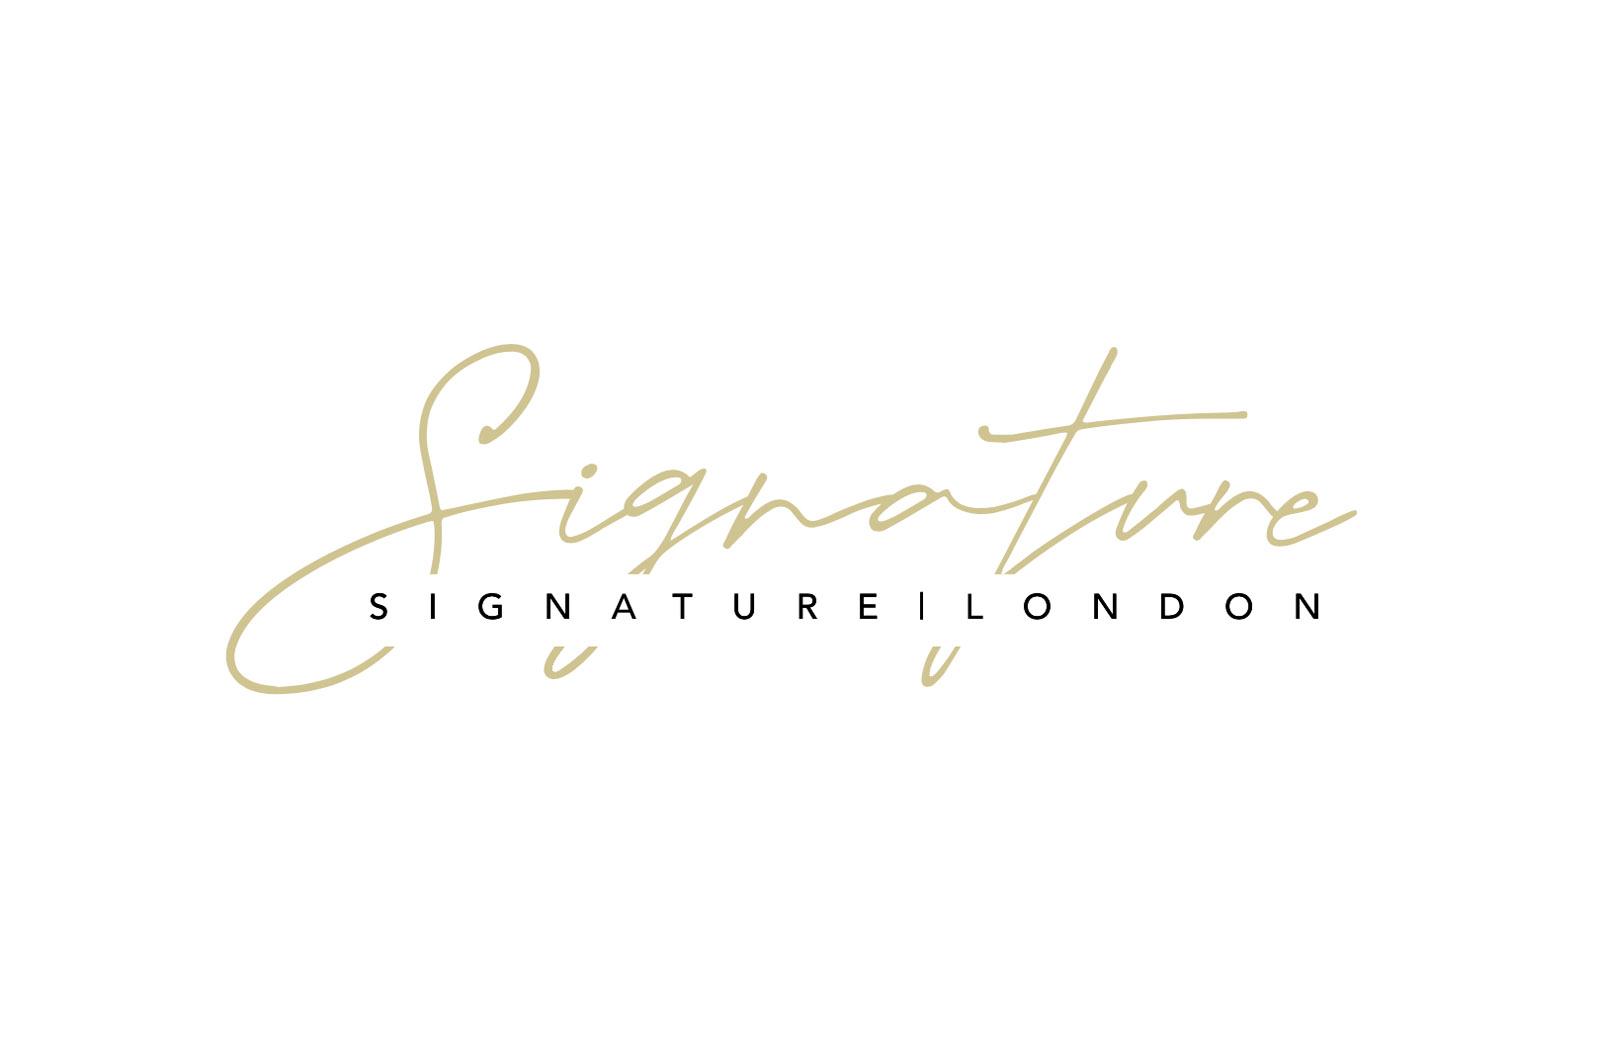 luxury-brand-identity-design-london03